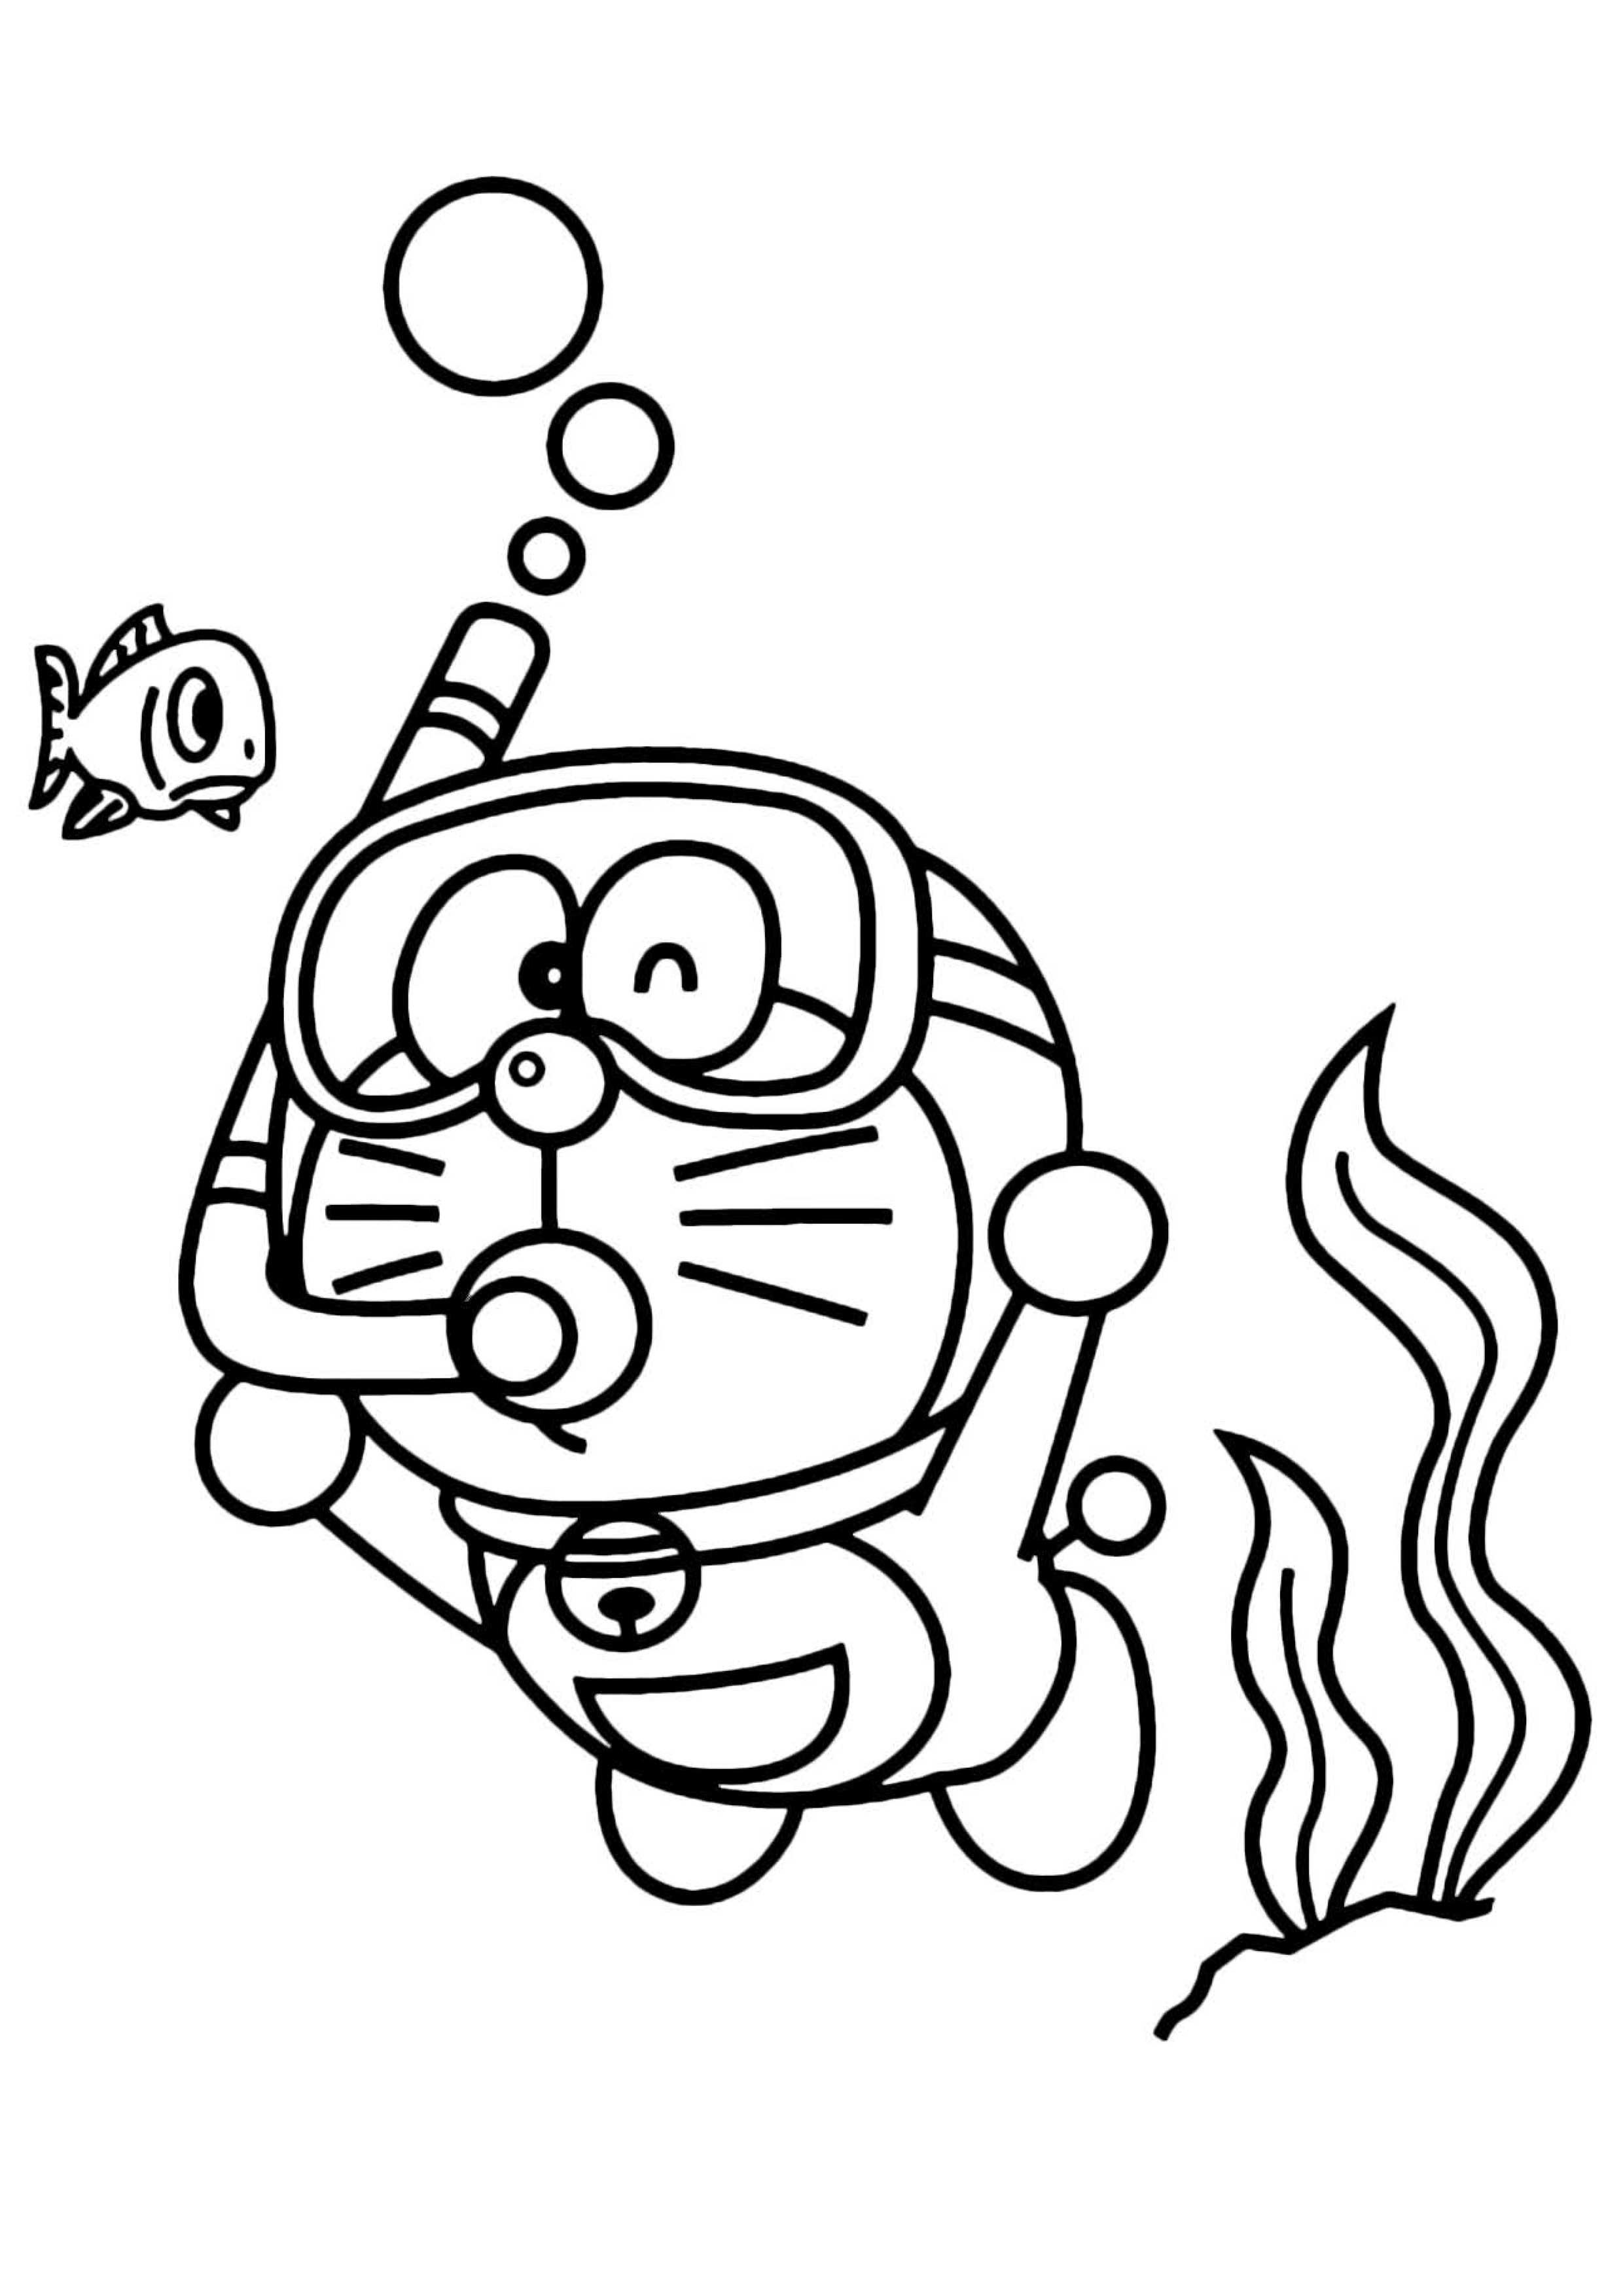 Doraemon-11